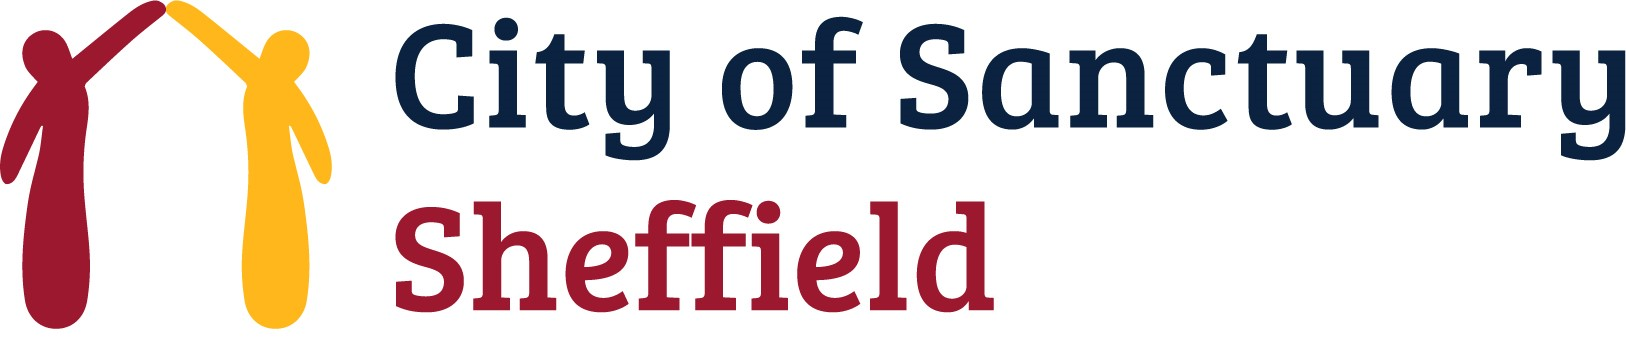 city-of-sanct-logo-landscape-RGB-full-1